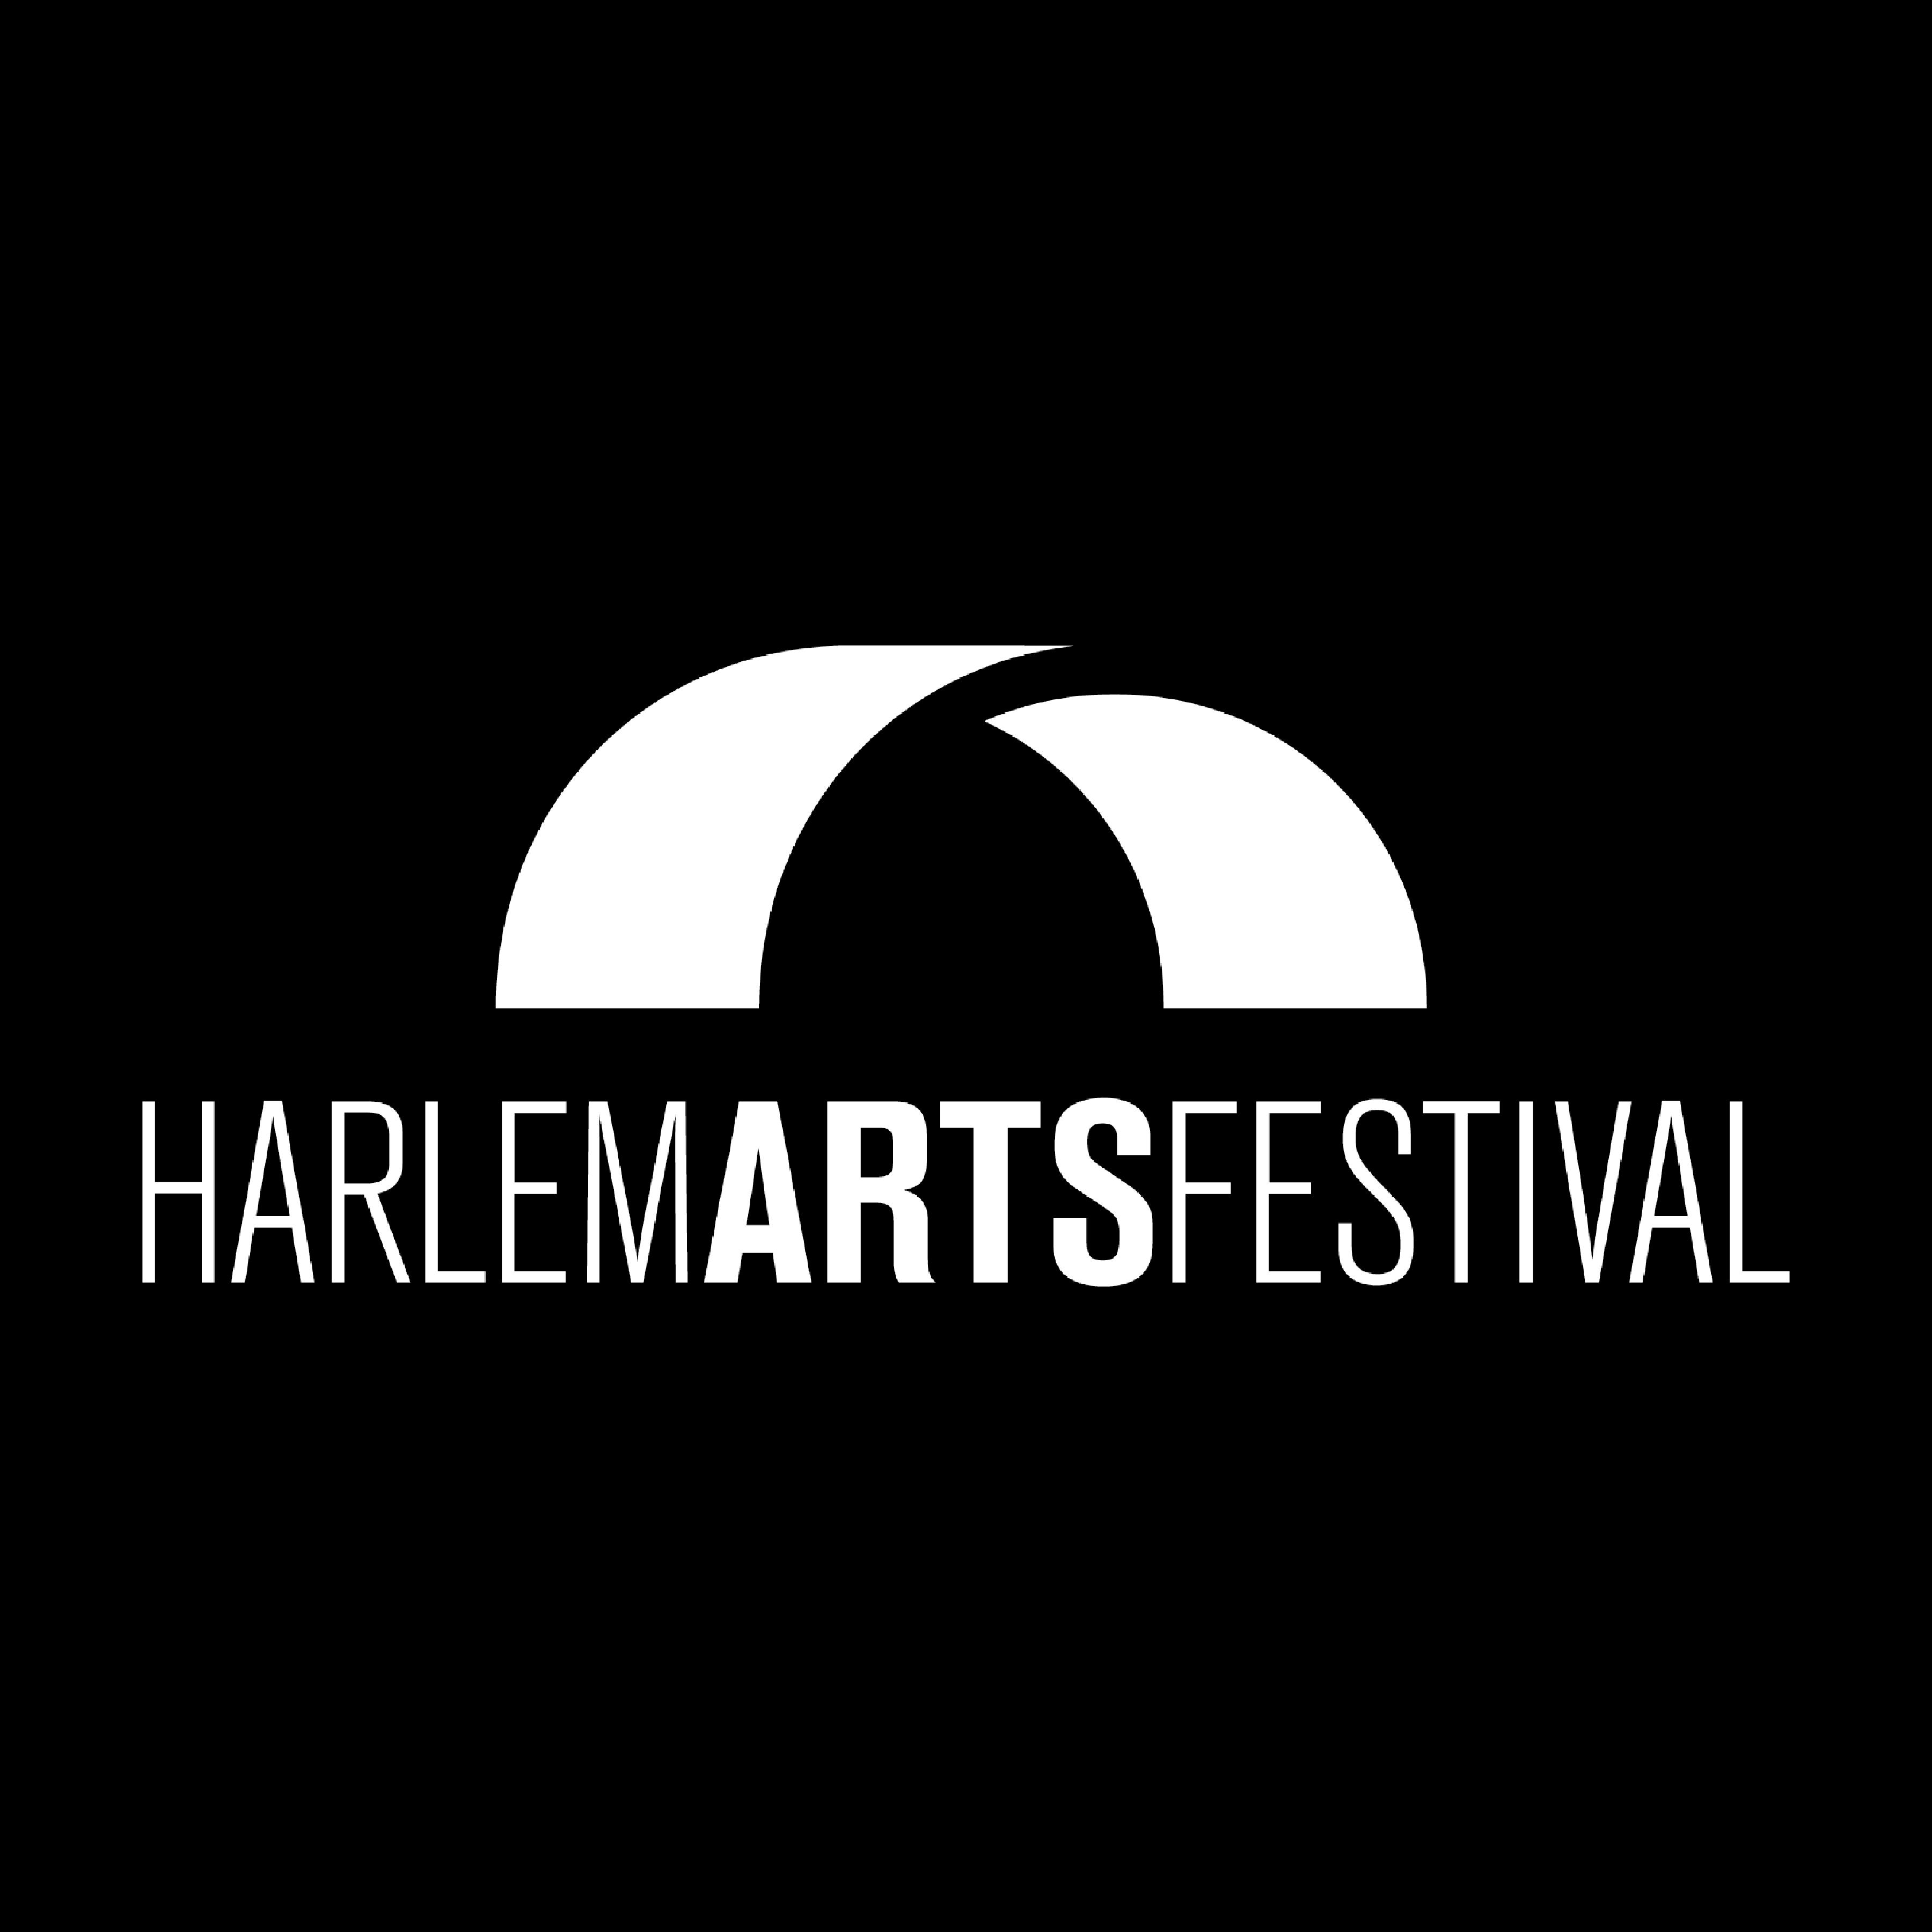 Harlem Arts Festival, June 25 – 26